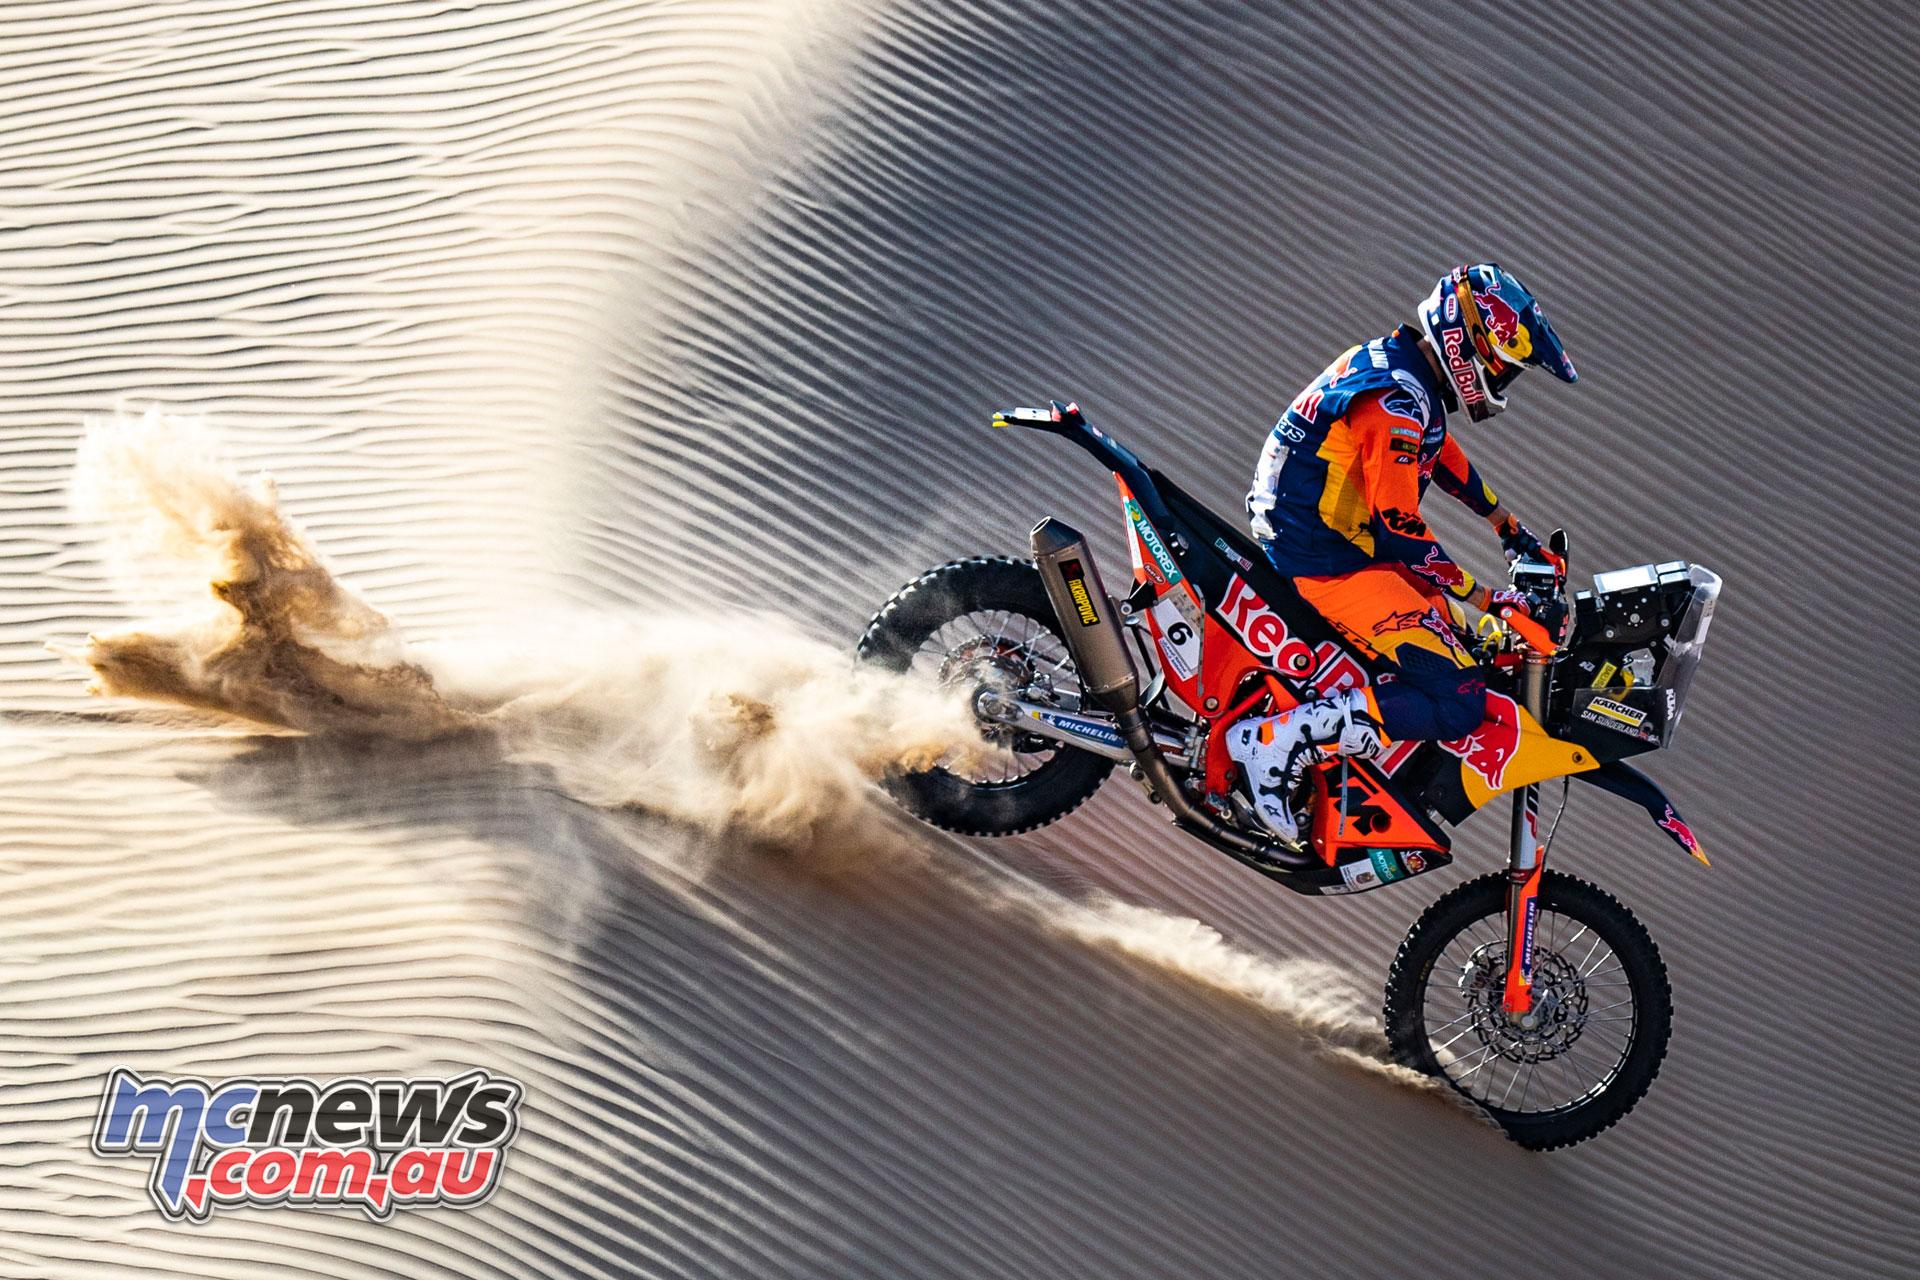 Sam Sunderland KTM RALLY Abu Dhabi Desert Challenge